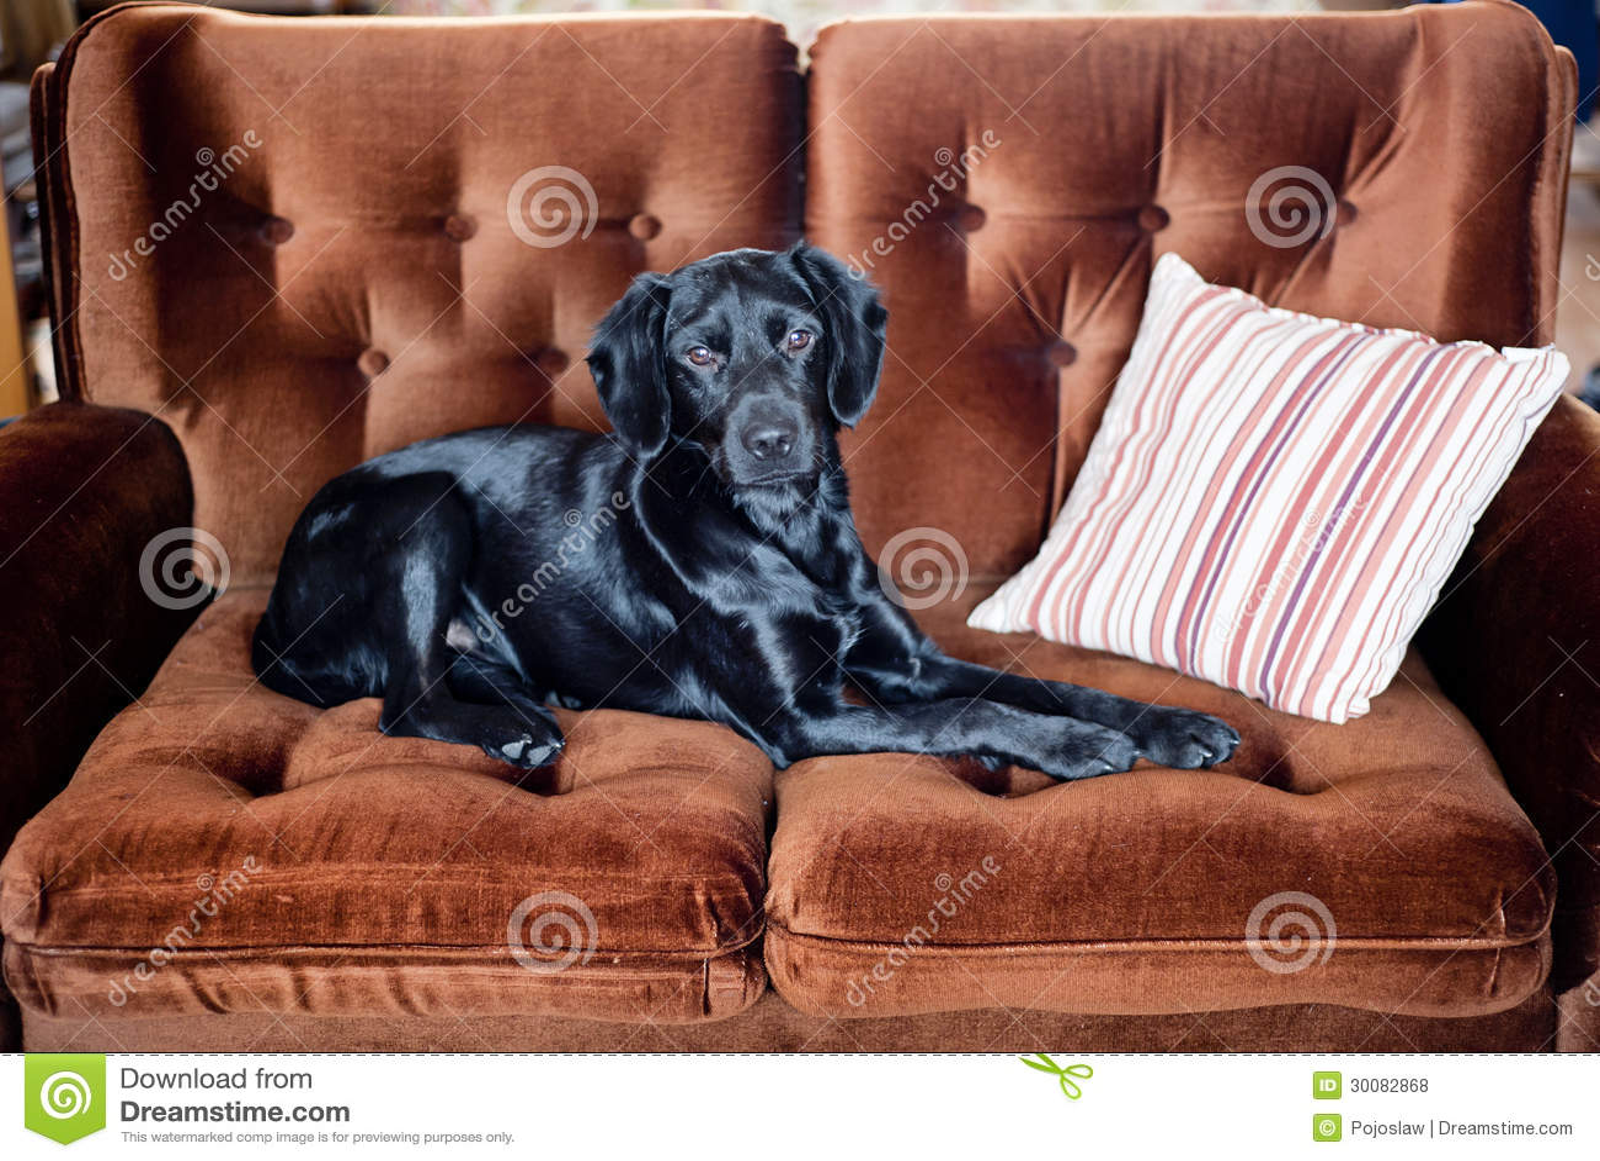 crazy sofa ride flat cushions handsome beauty cute animal vector illustration